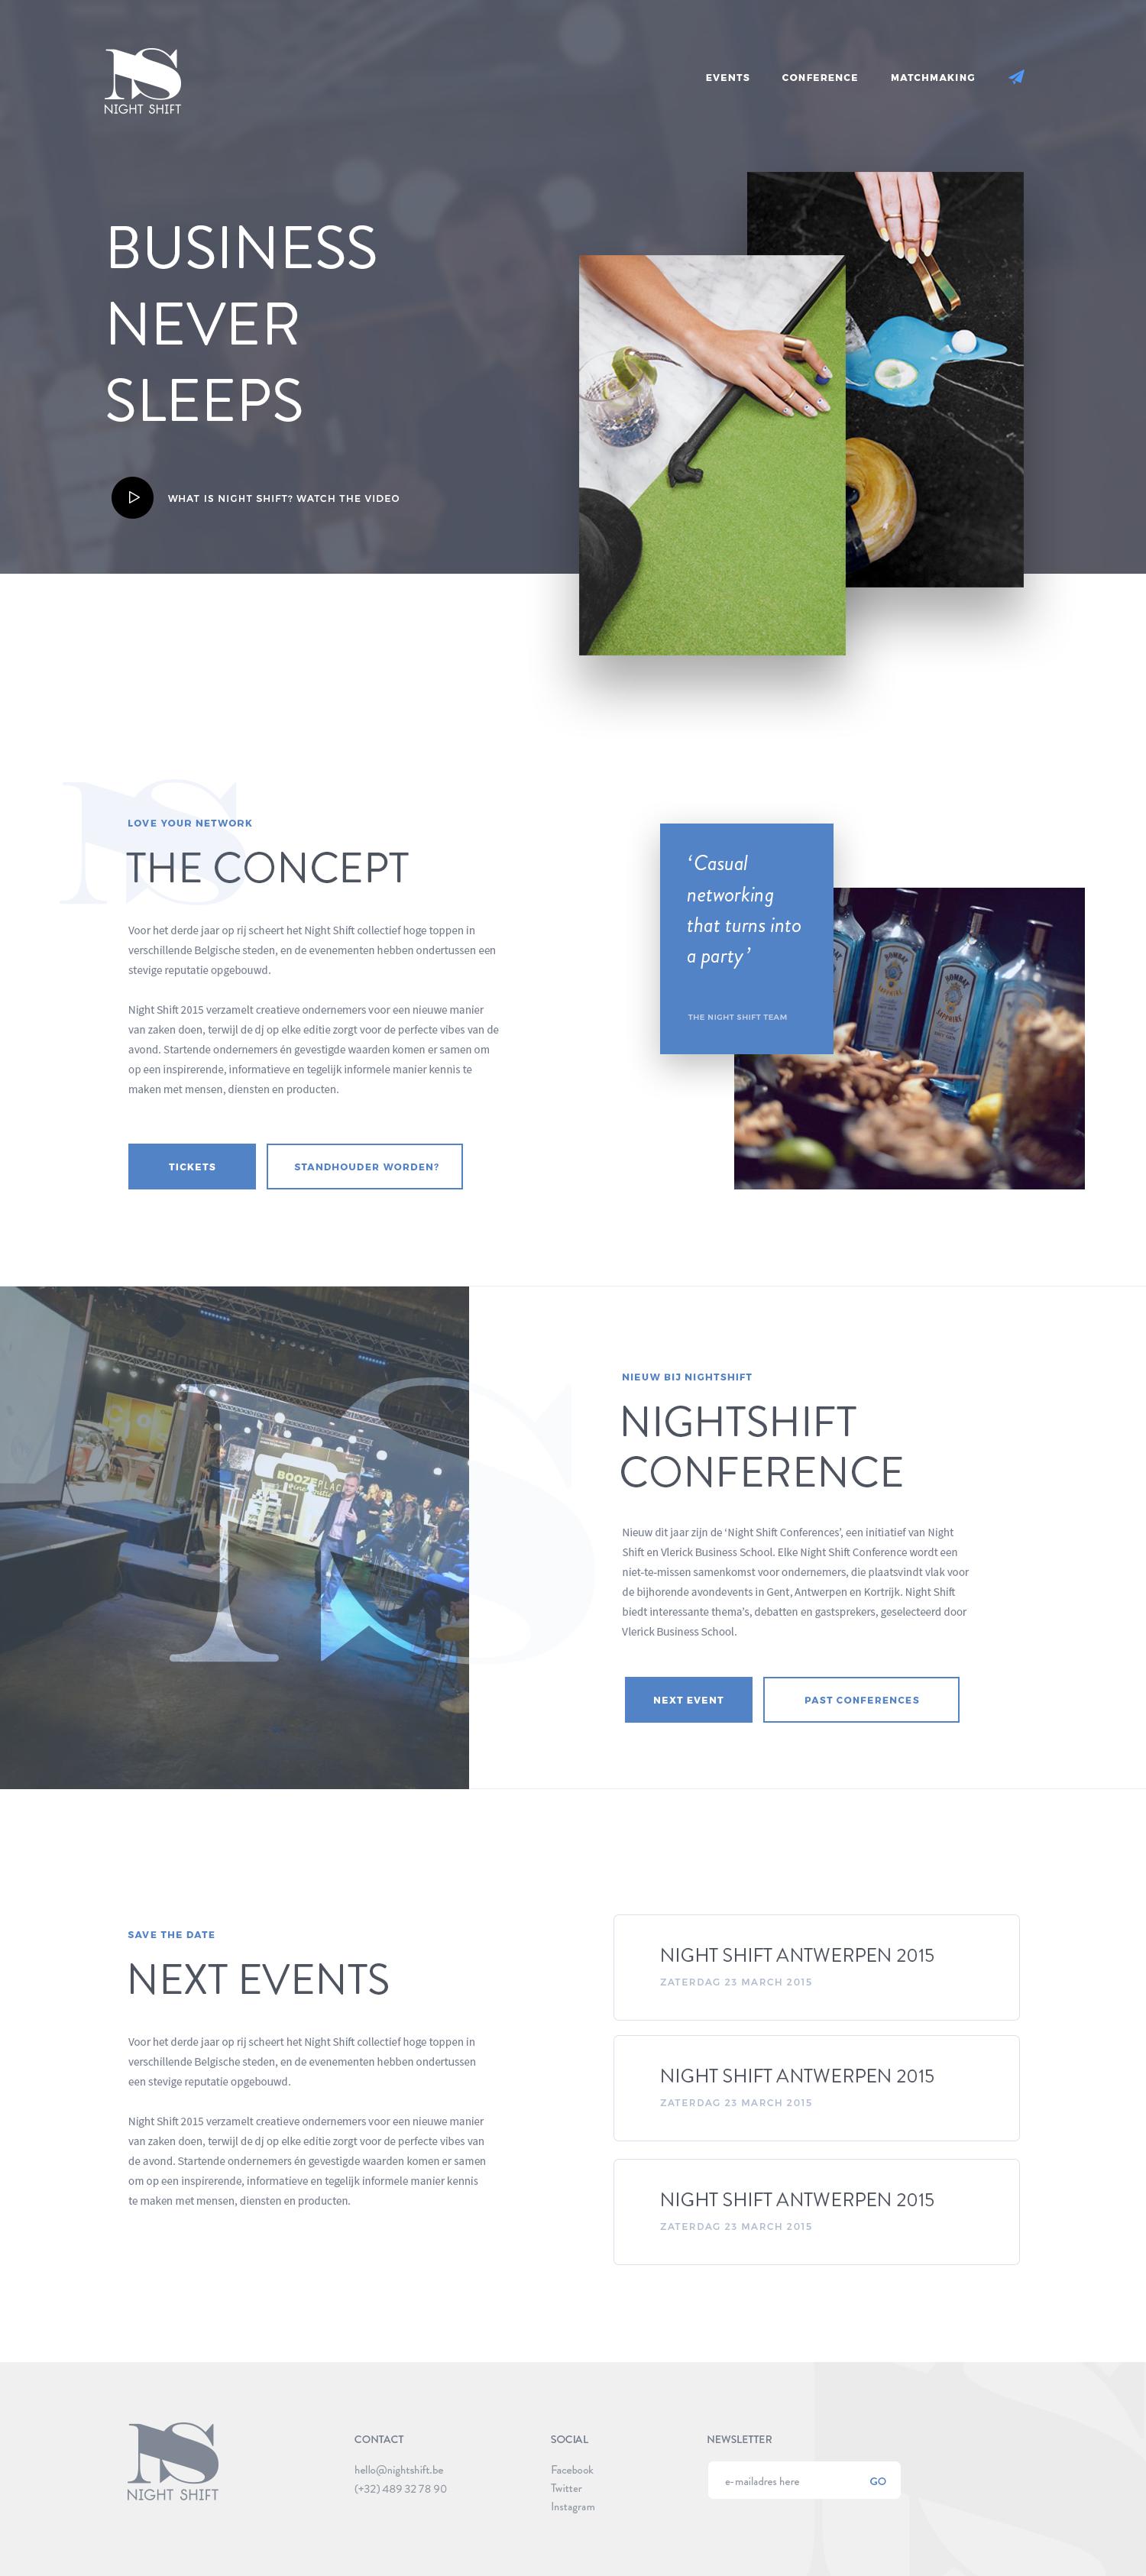 Ns Home. Ns Home Business Web Design ...